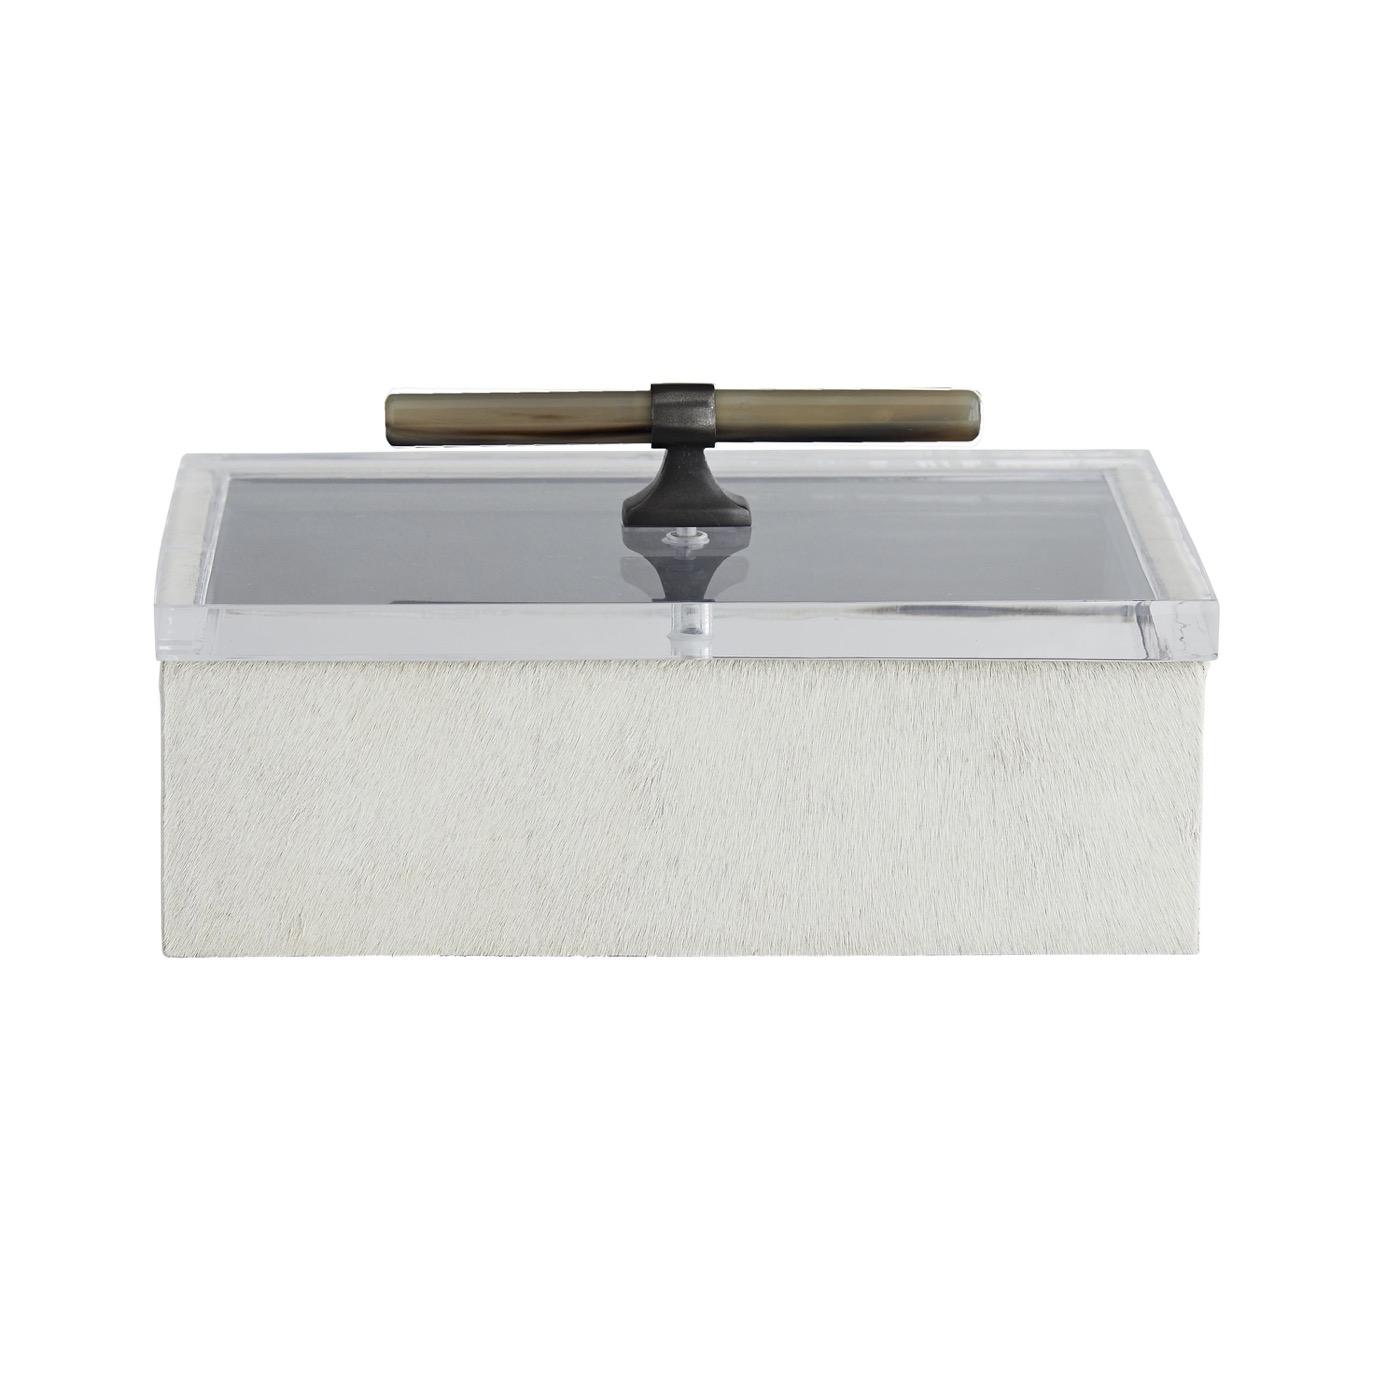 Roberta Hide Box